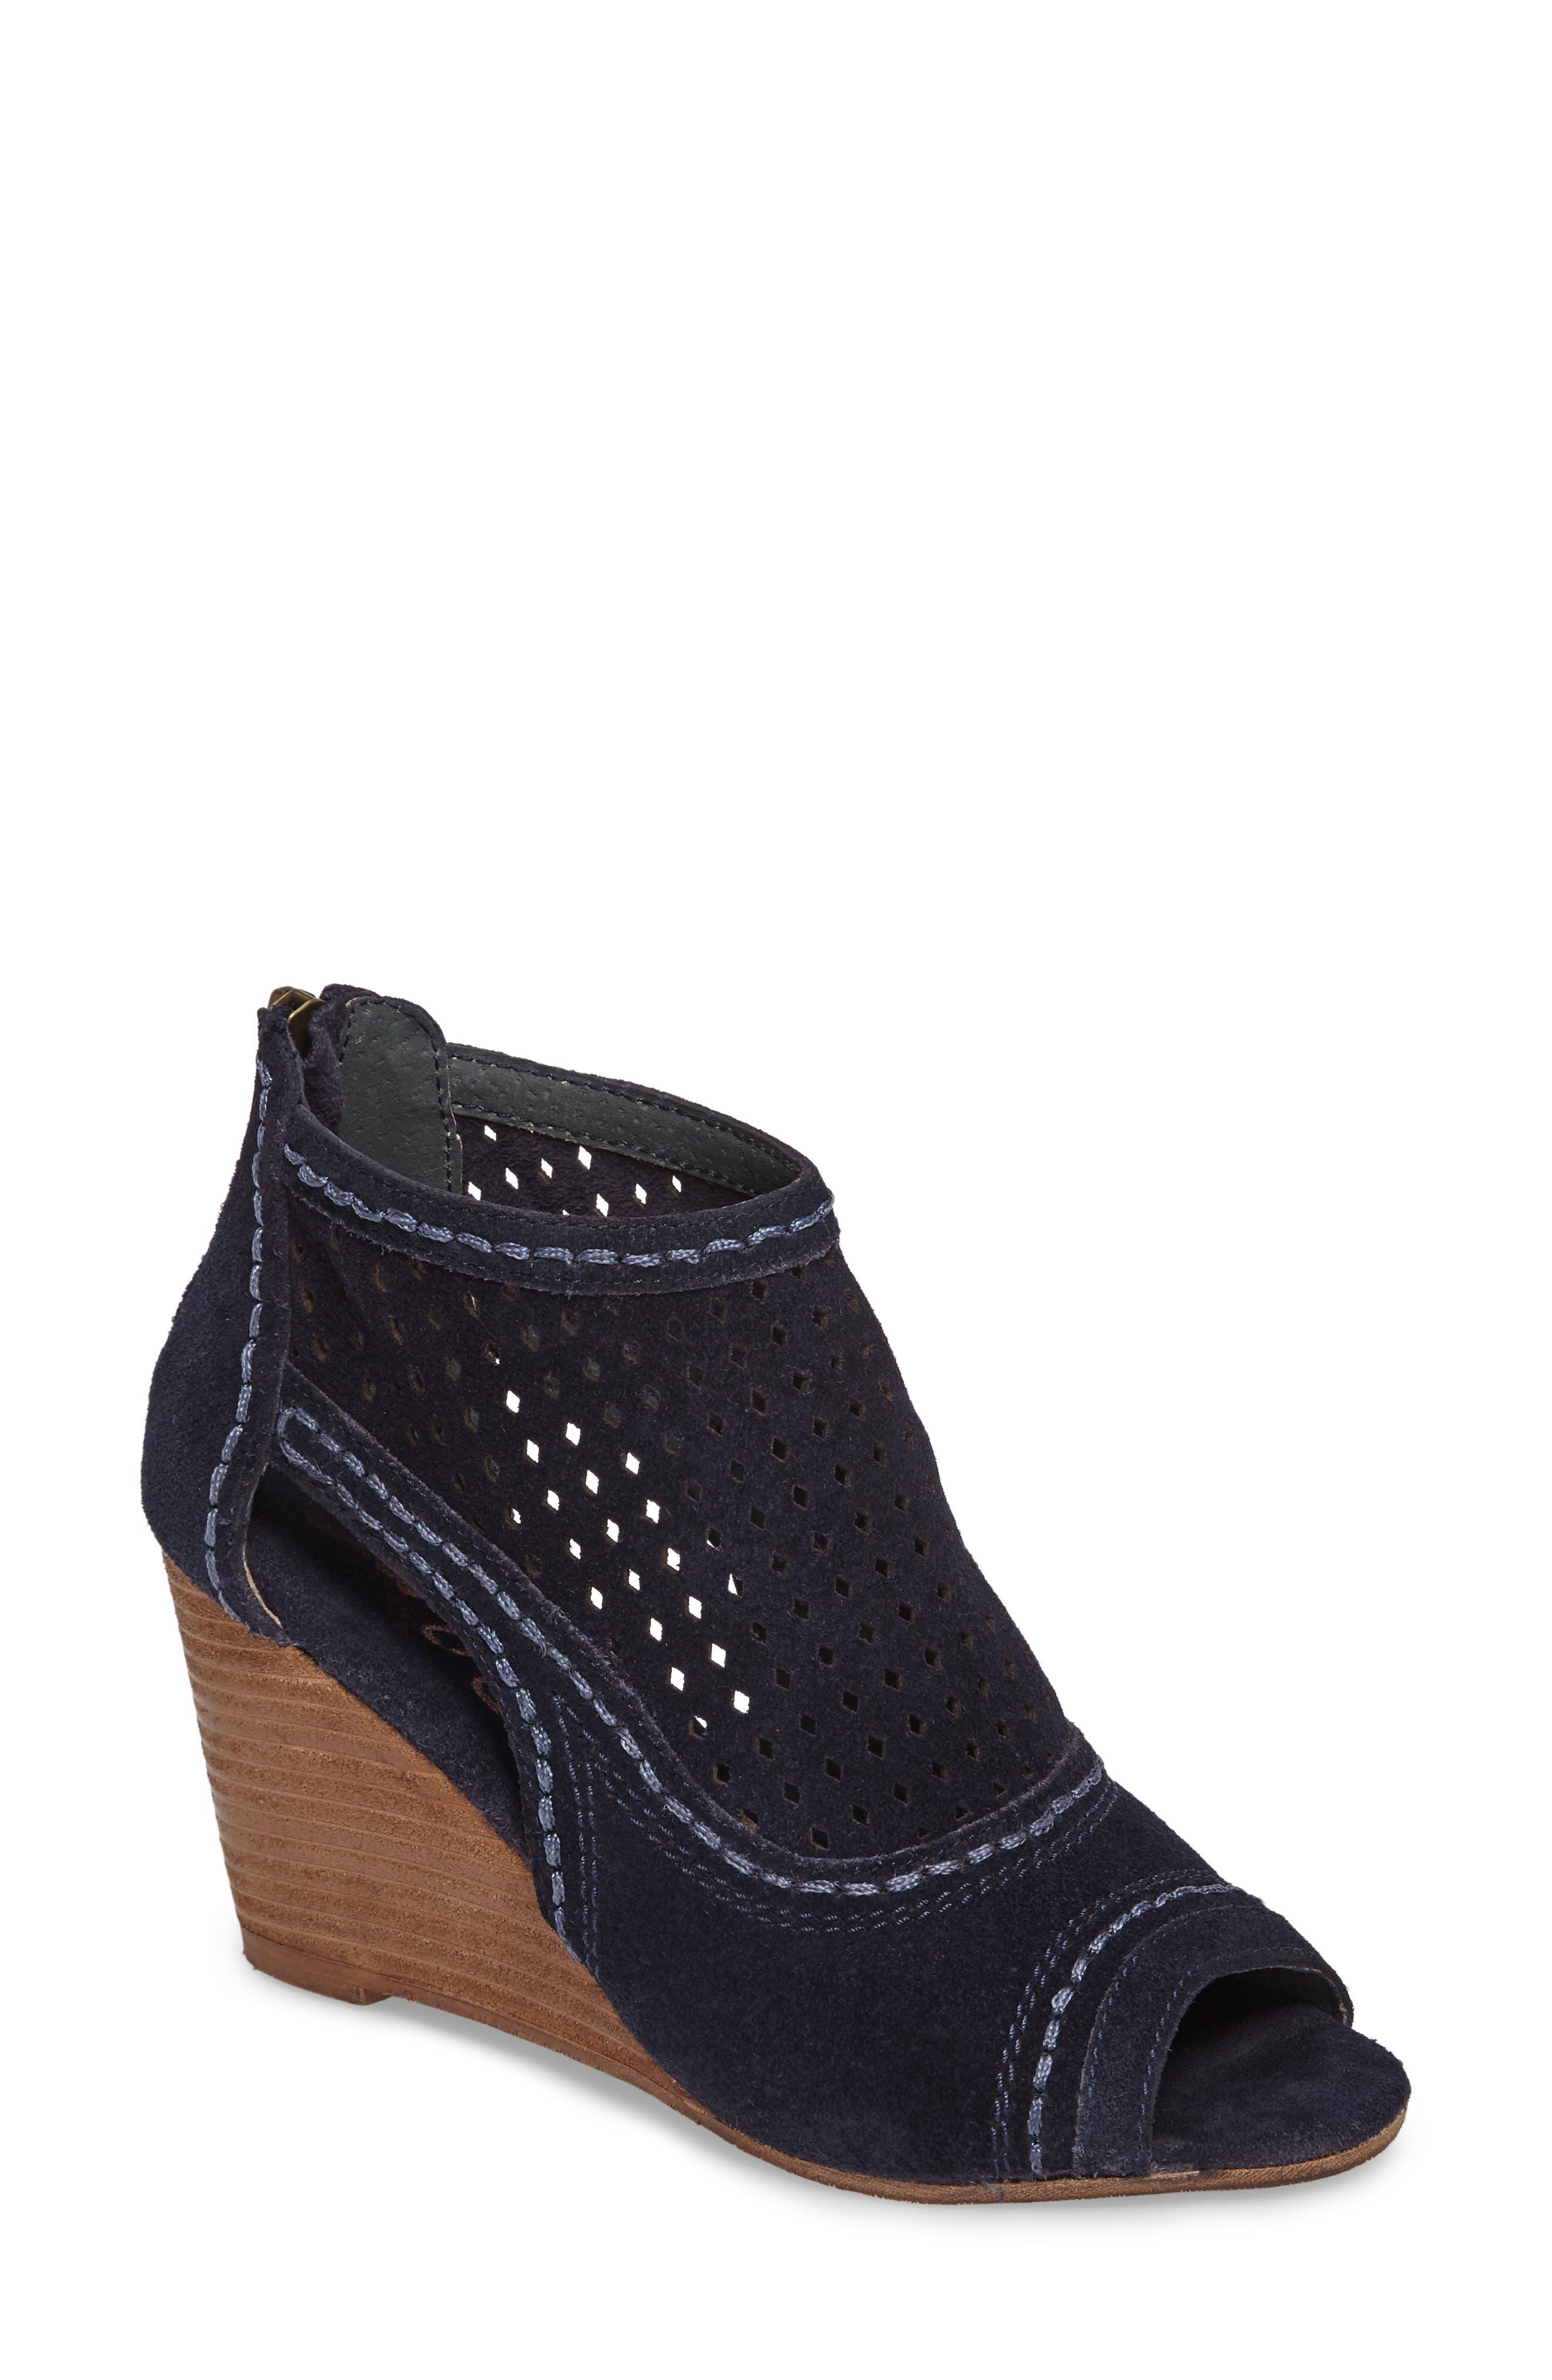 Sharon Perforated Wedge Sandal,                             Main thumbnail 2, color,